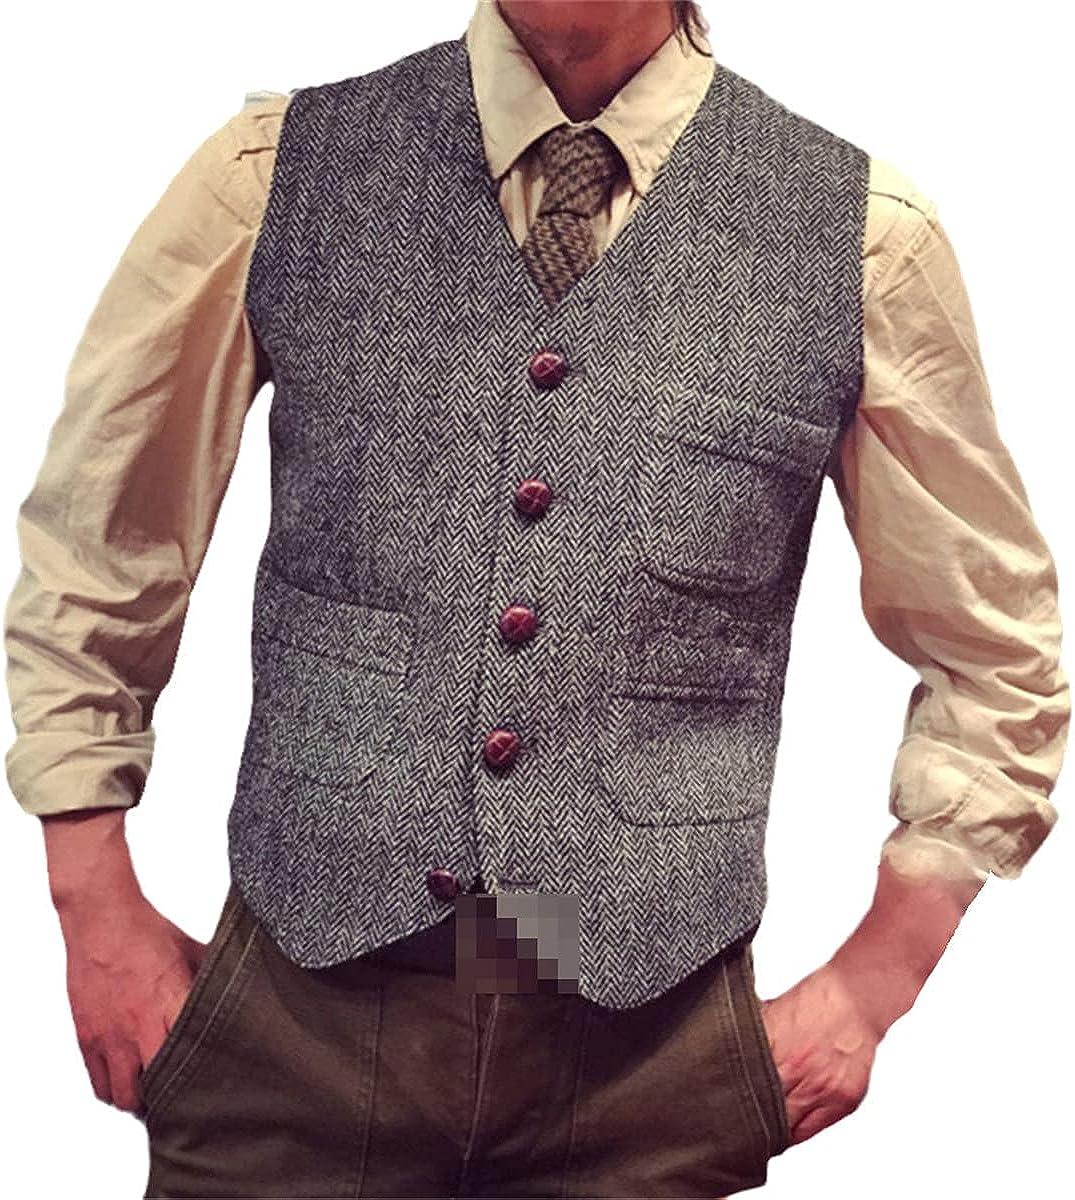 Men's vest suit business vest jacket green Victorian style clothing wedding men